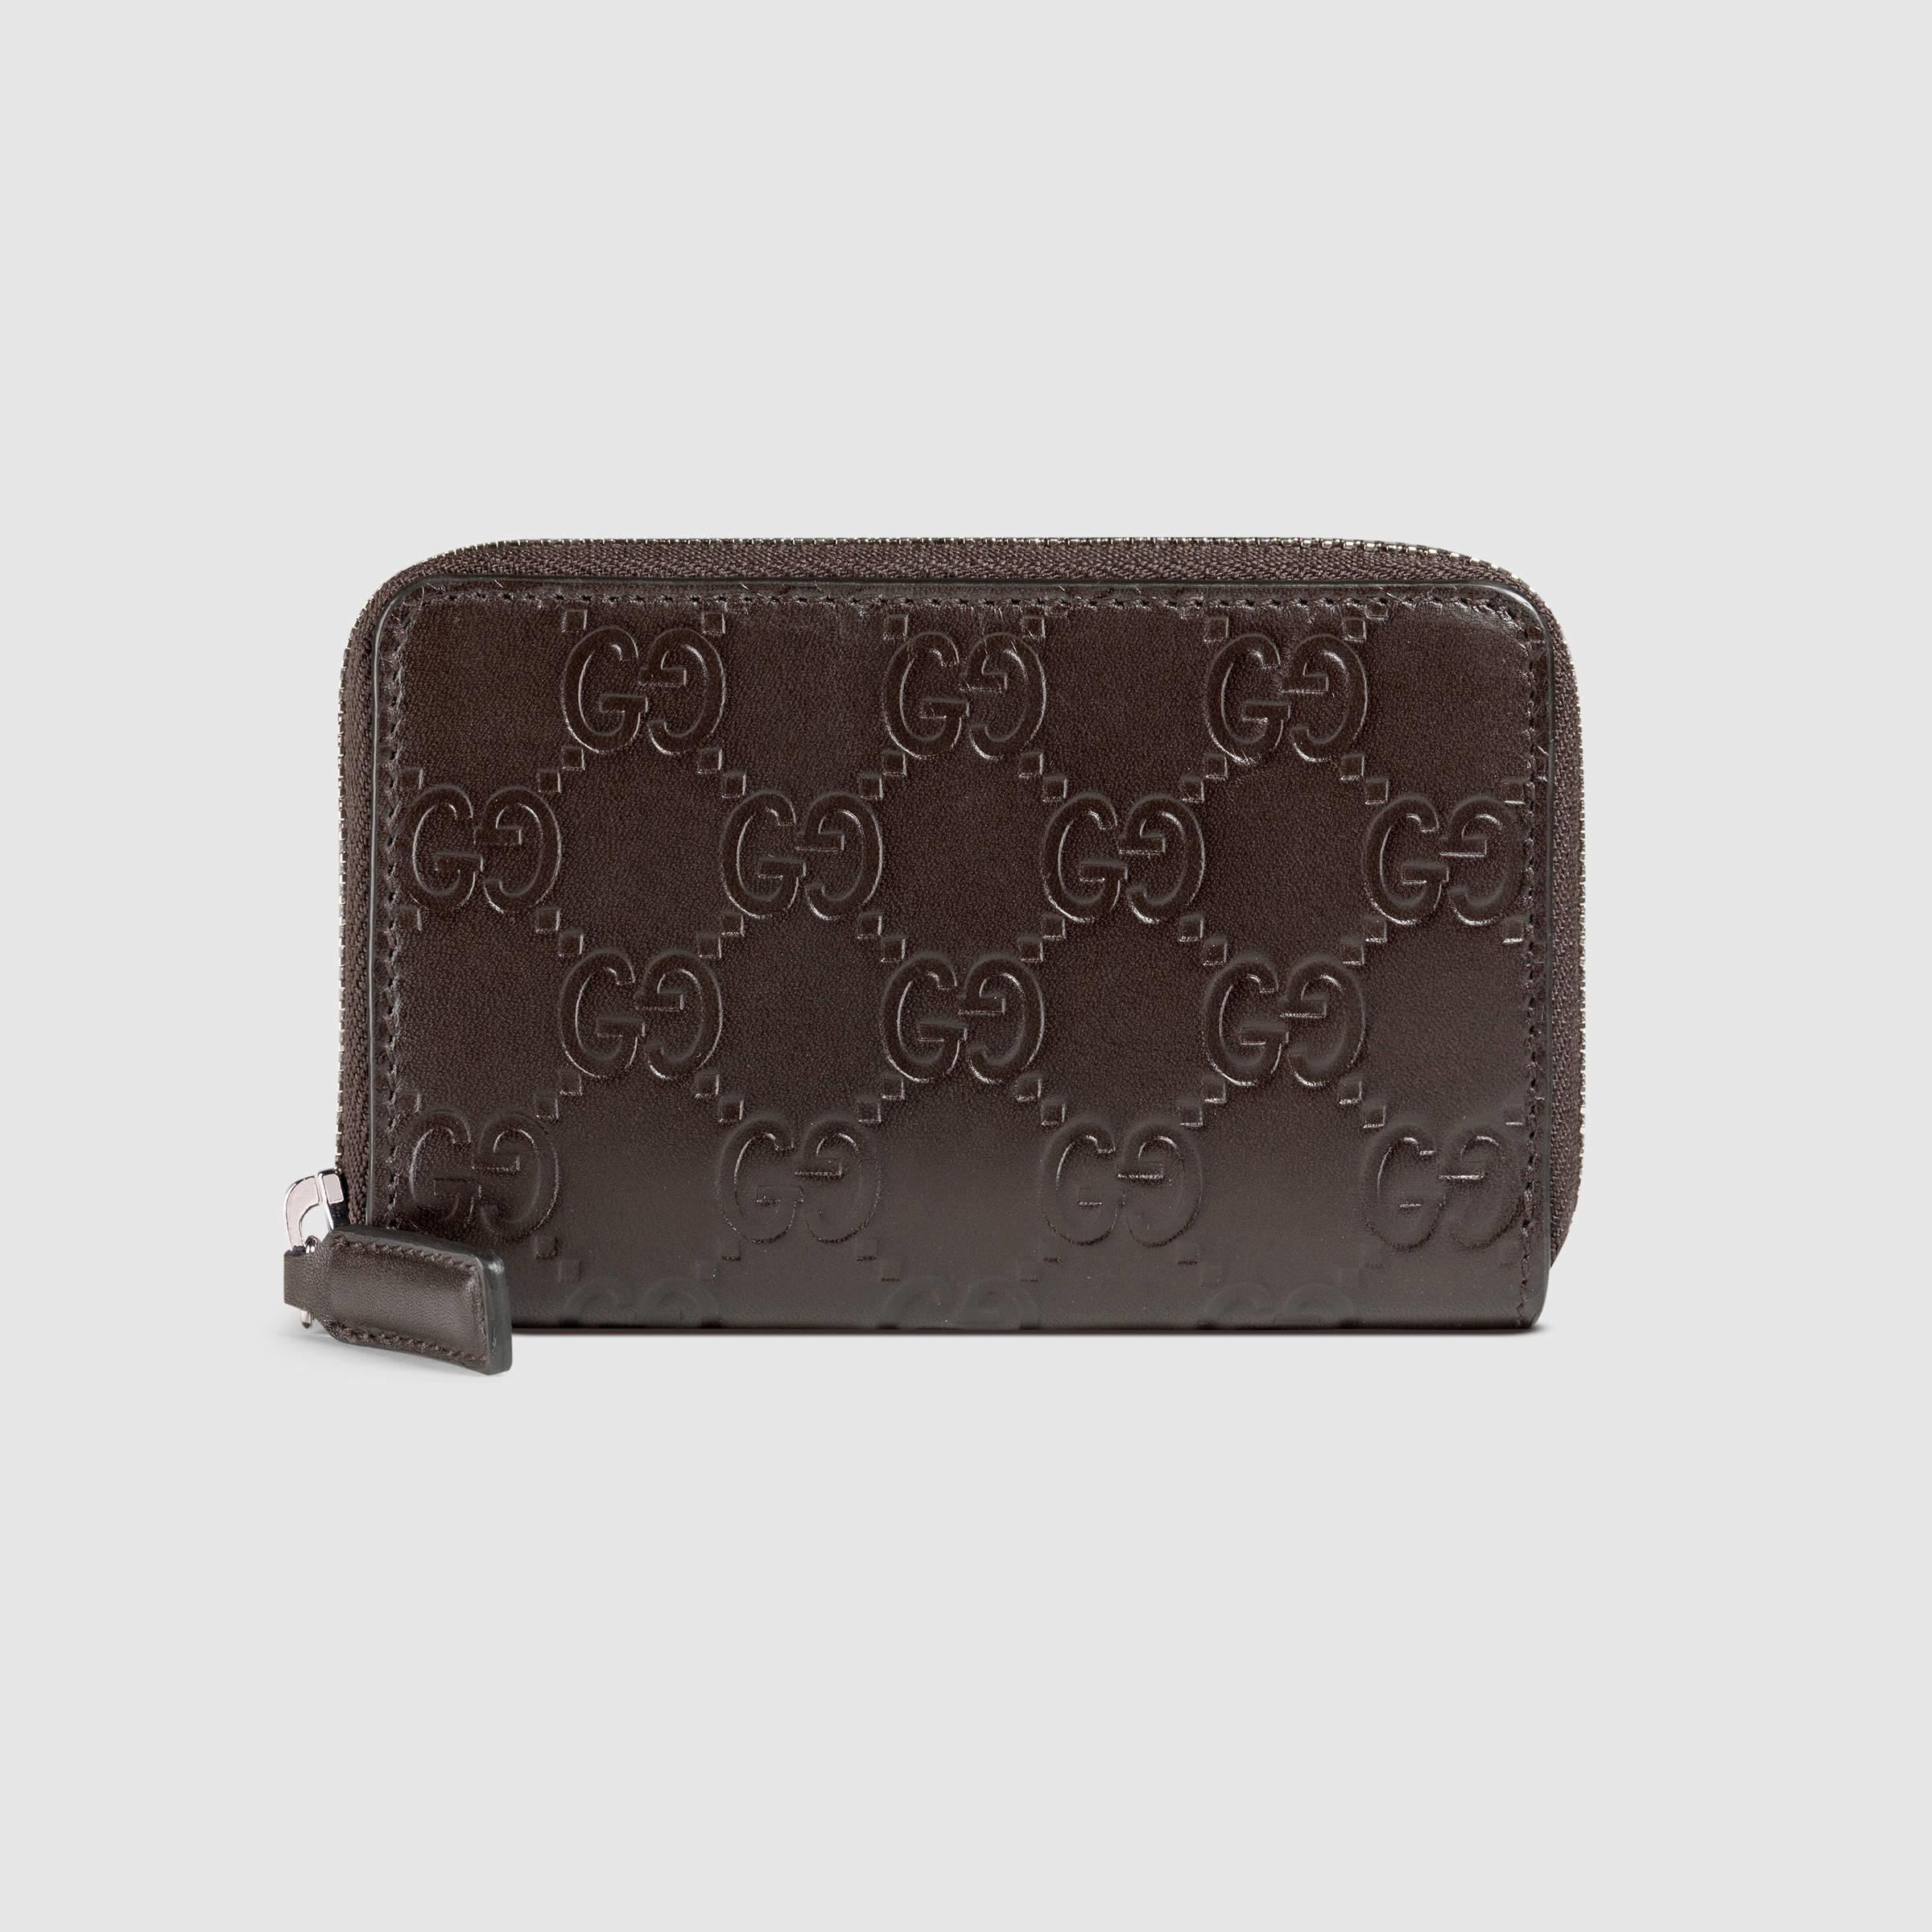 Lyst - Gucci Signature Zip Around Card Case in Black for Men